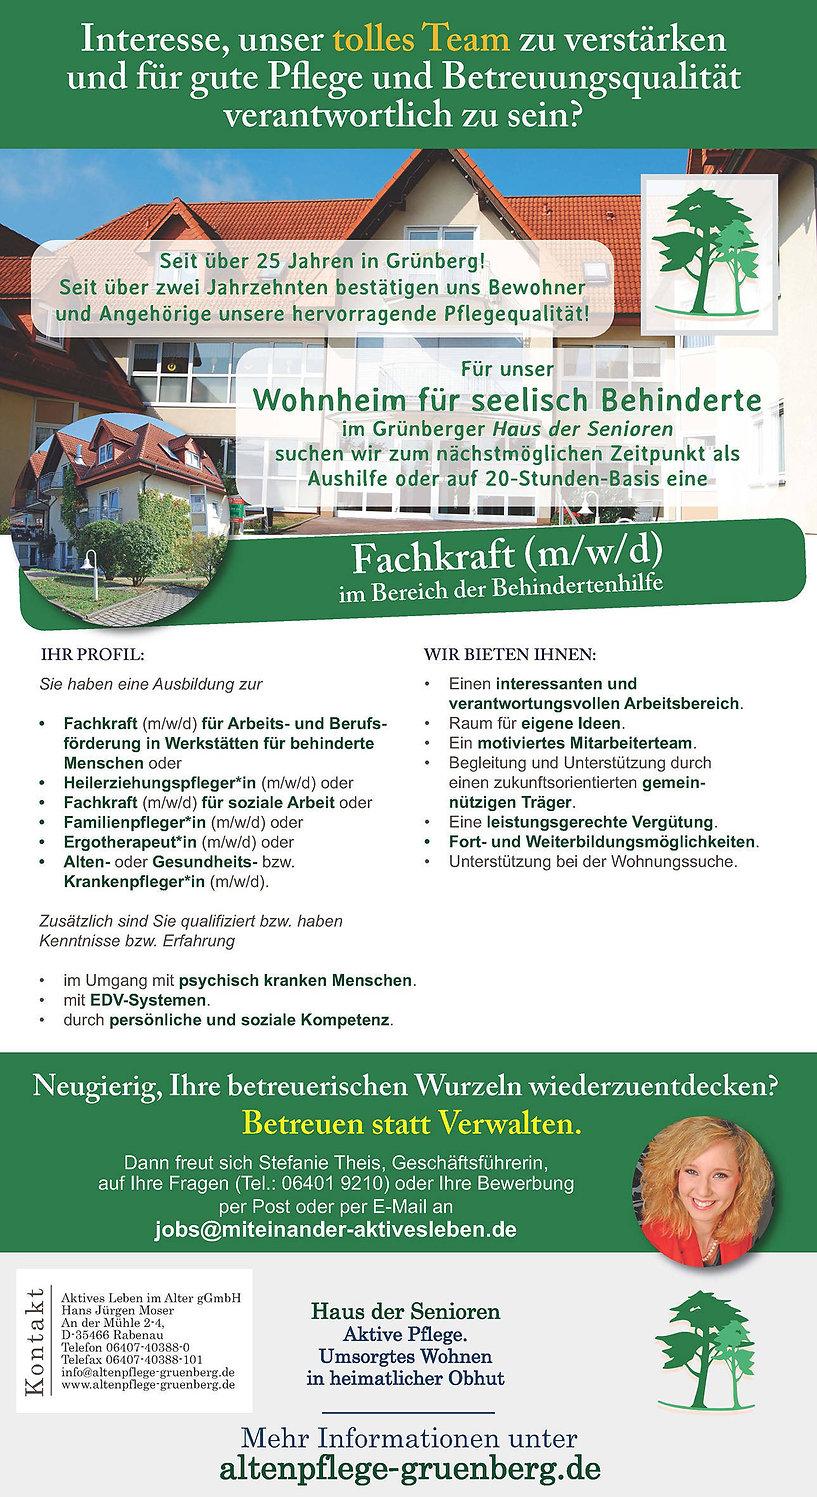 HdS_WohnheimfsB_072021_web.jpg